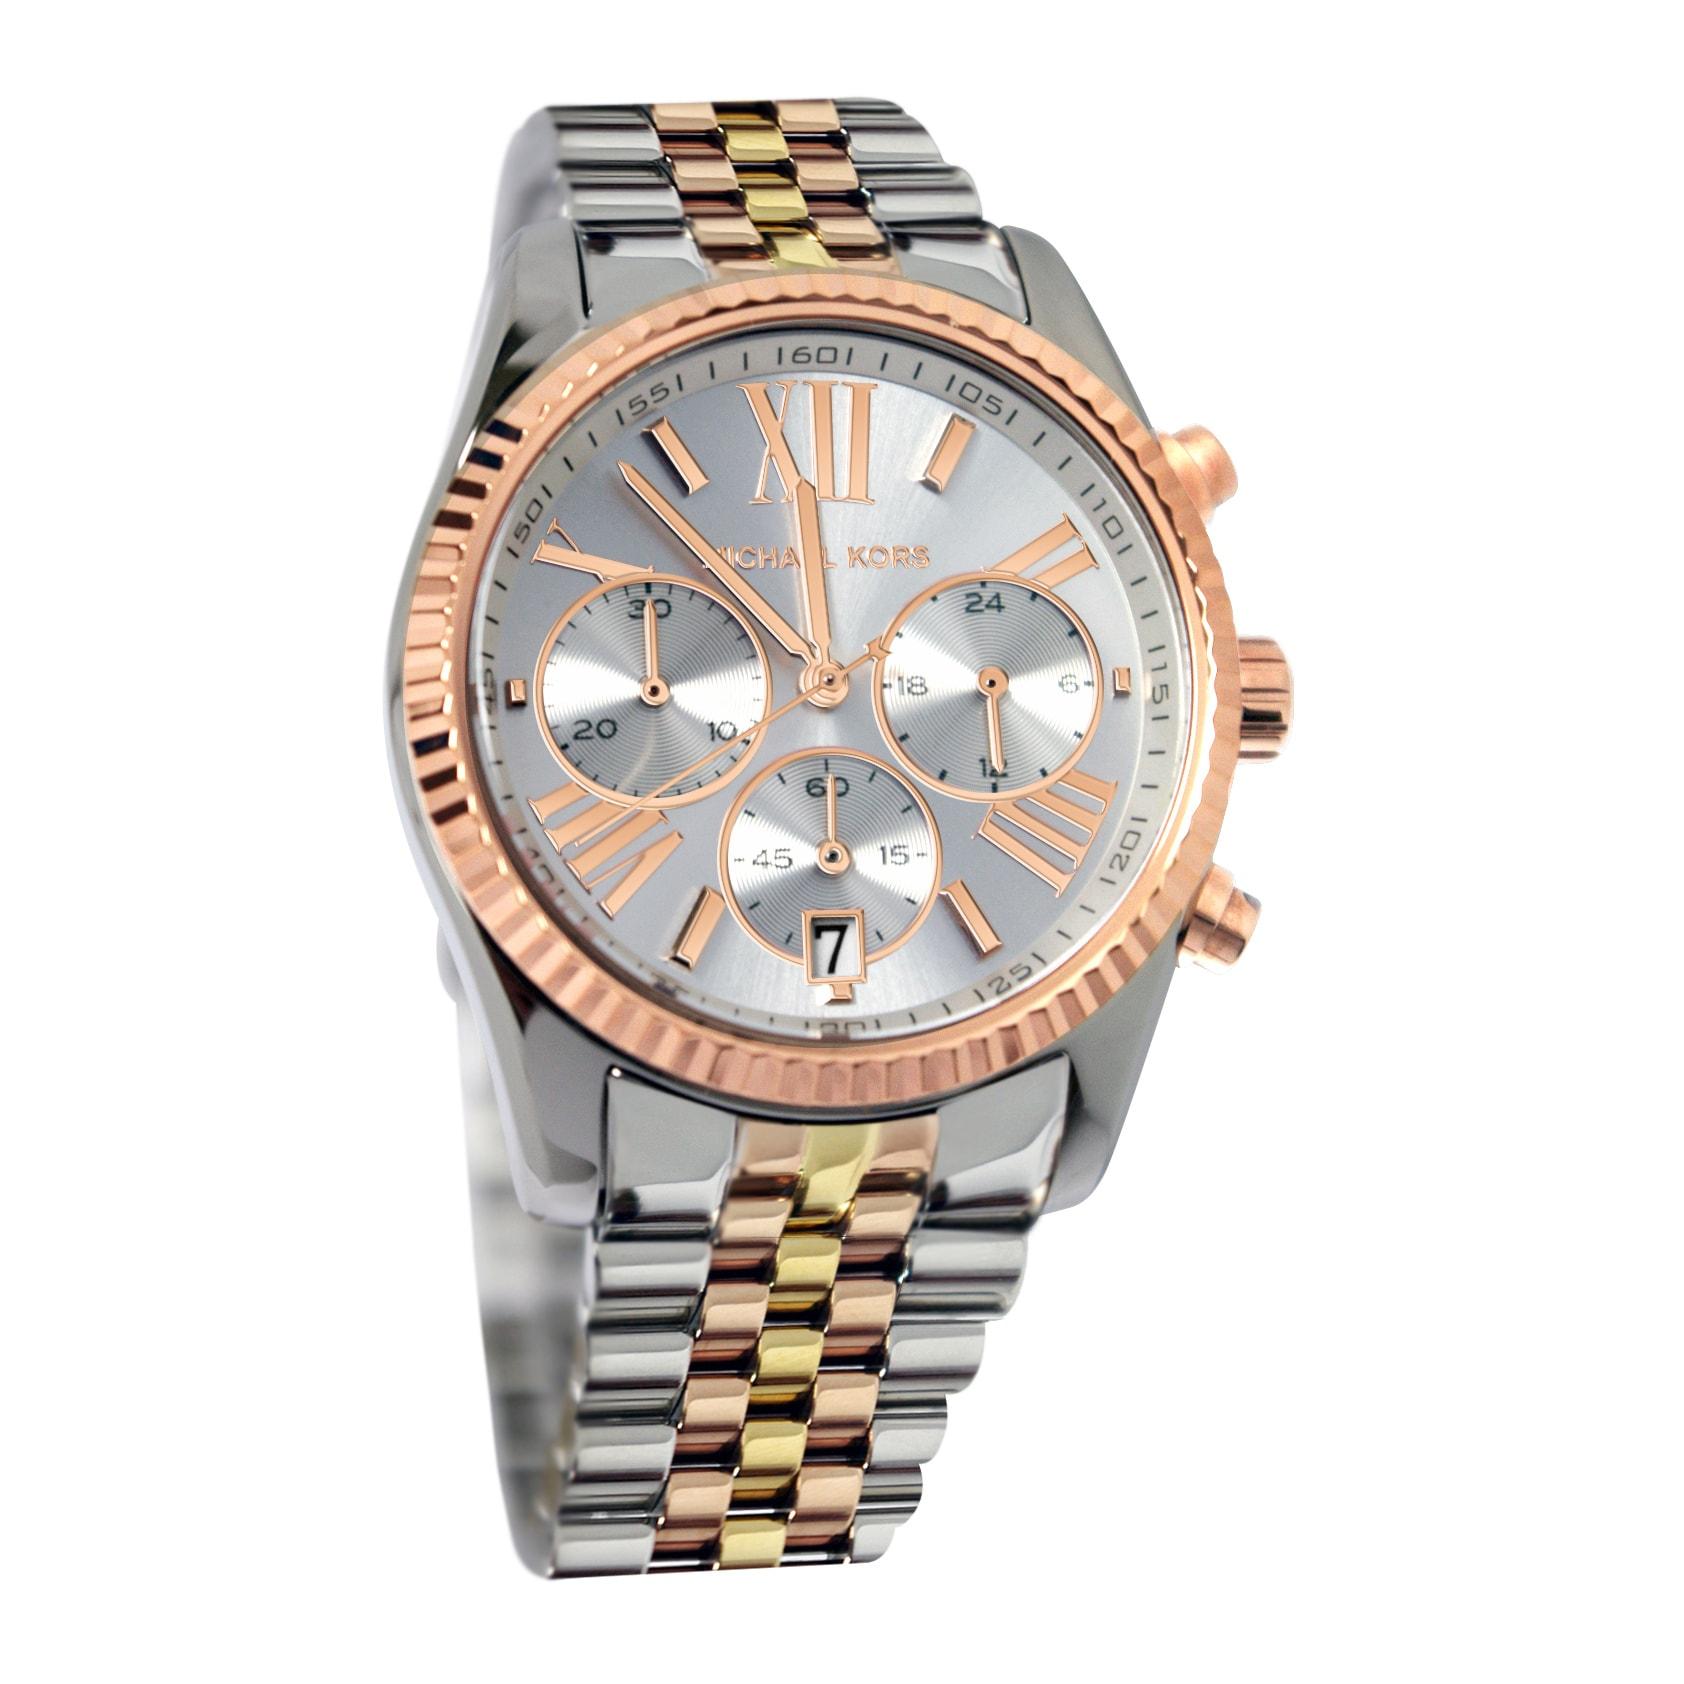 1970e11378ed Shop Michael Kors Women s Lexington MK5735 Watch - WHITE GOLD - WHITE GOLD  - Free Shipping Today - Overstock - 8202470